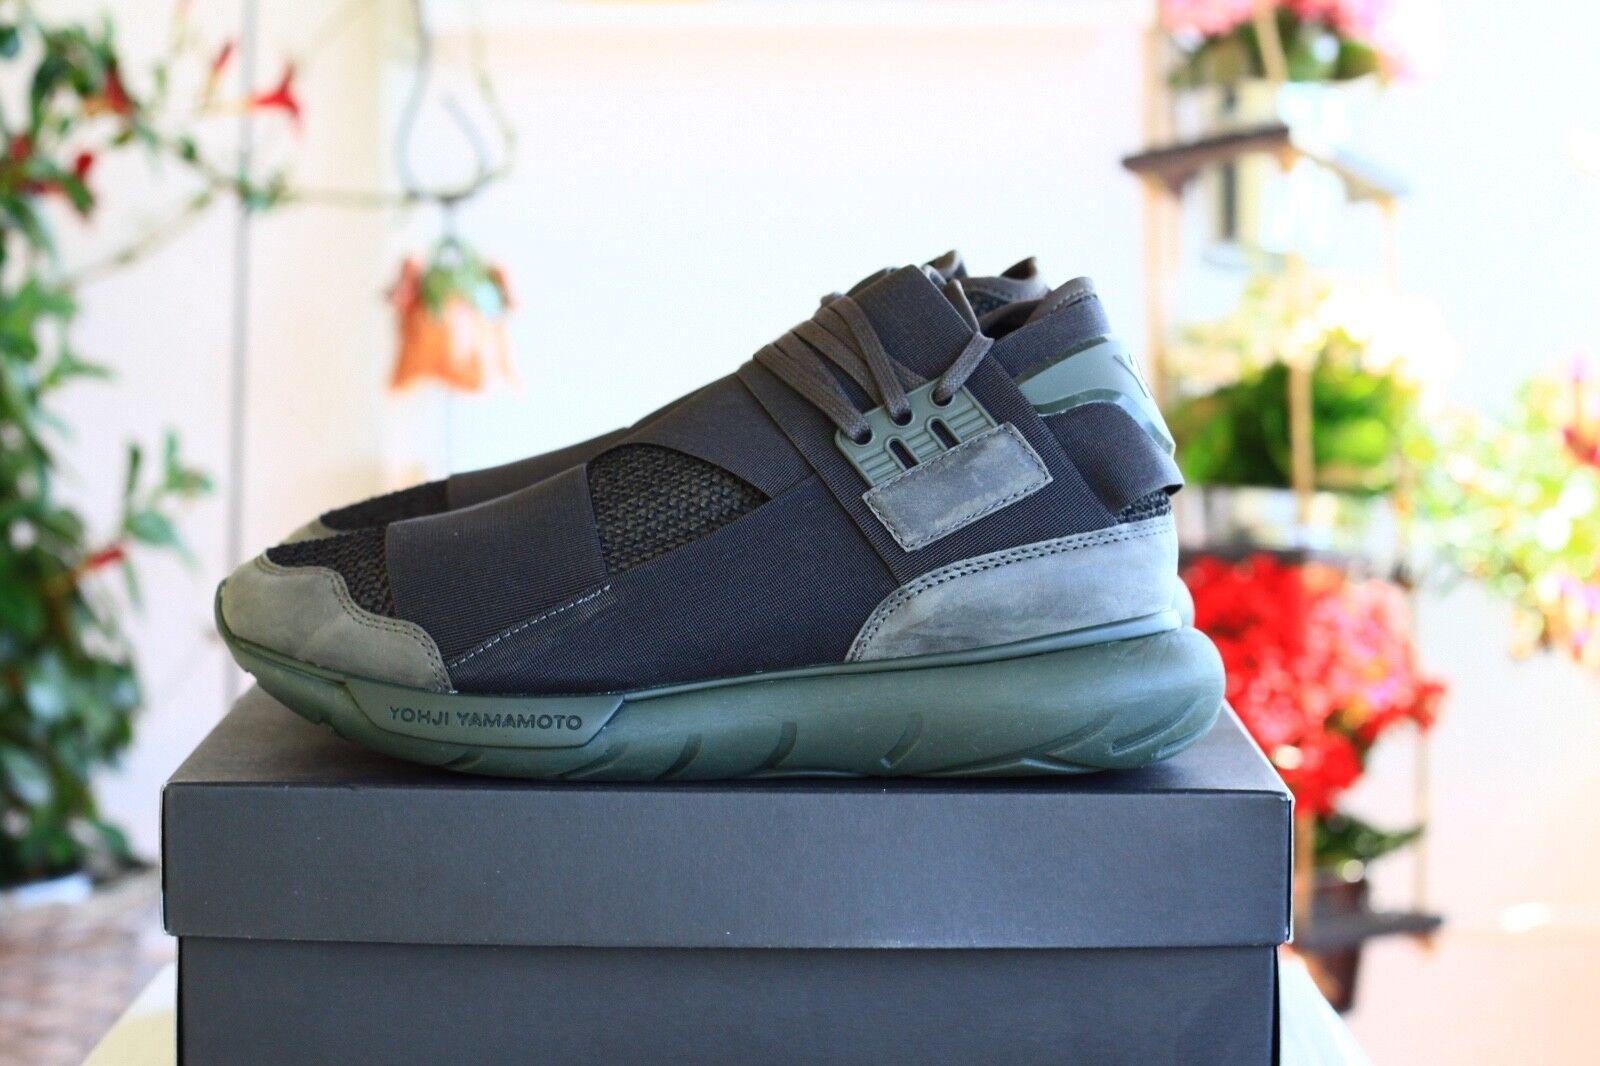 Adidas Y-3 QASA High Dark Olive 42 US8,5 *Yeezy Boost Ultra EQT NMD 4D Human 350